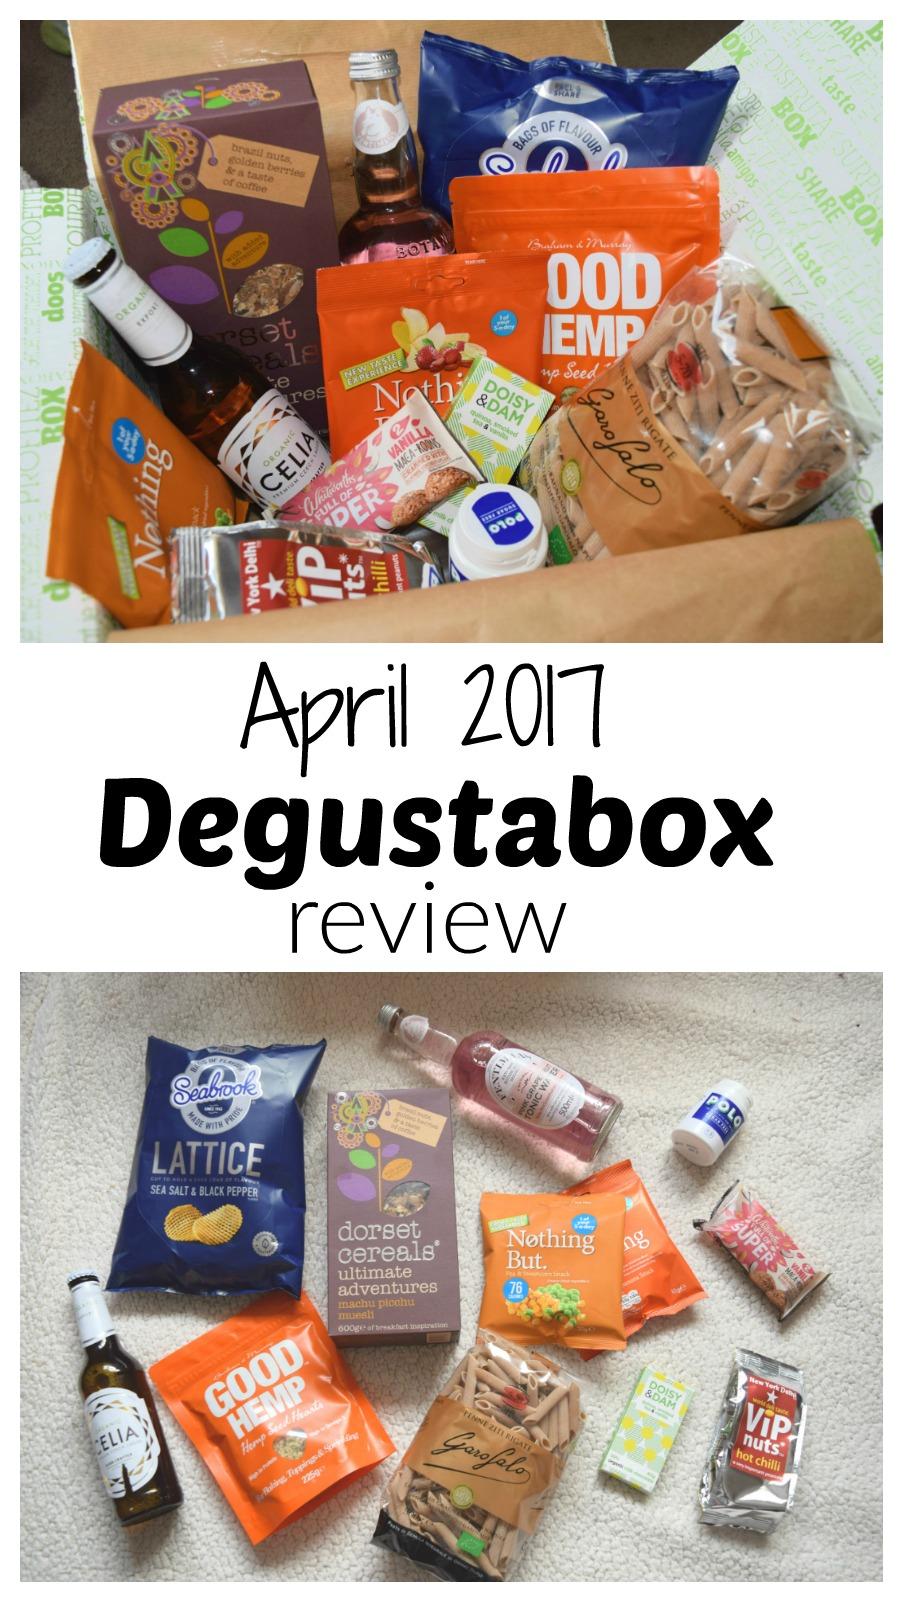 April 2017 Degustabox review